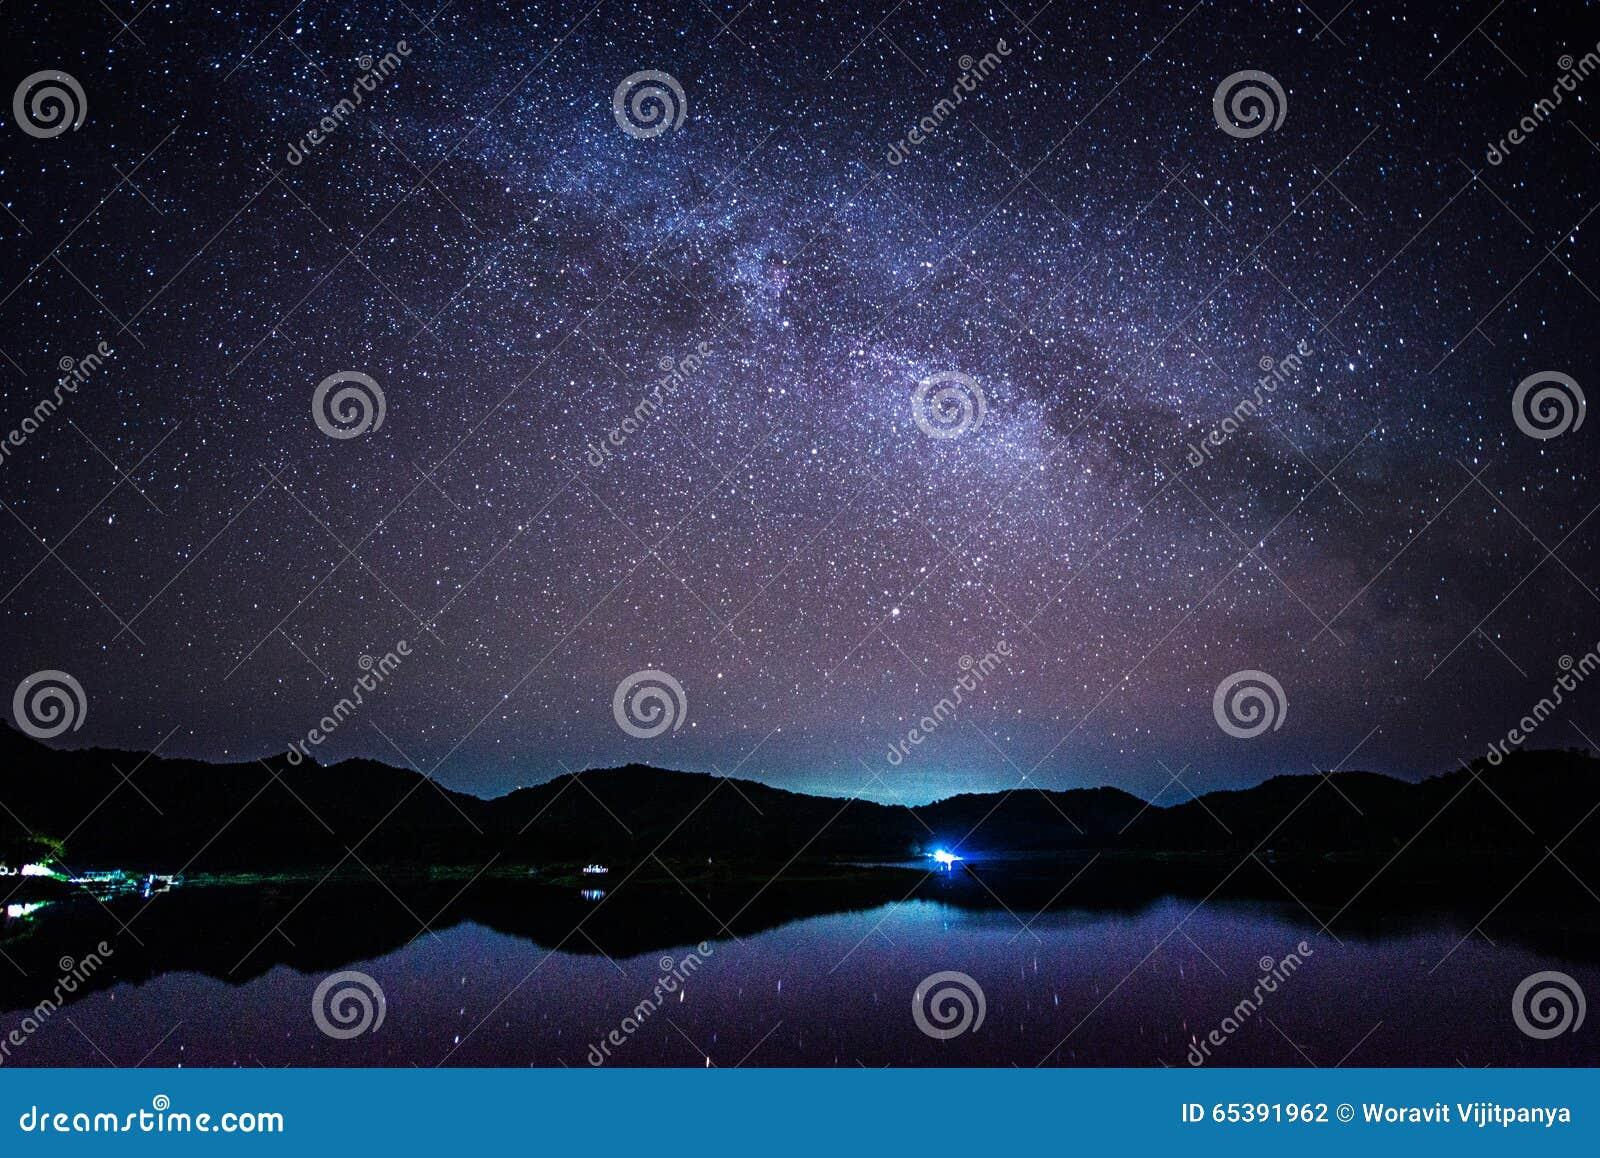 Milky Way, the Galaxy